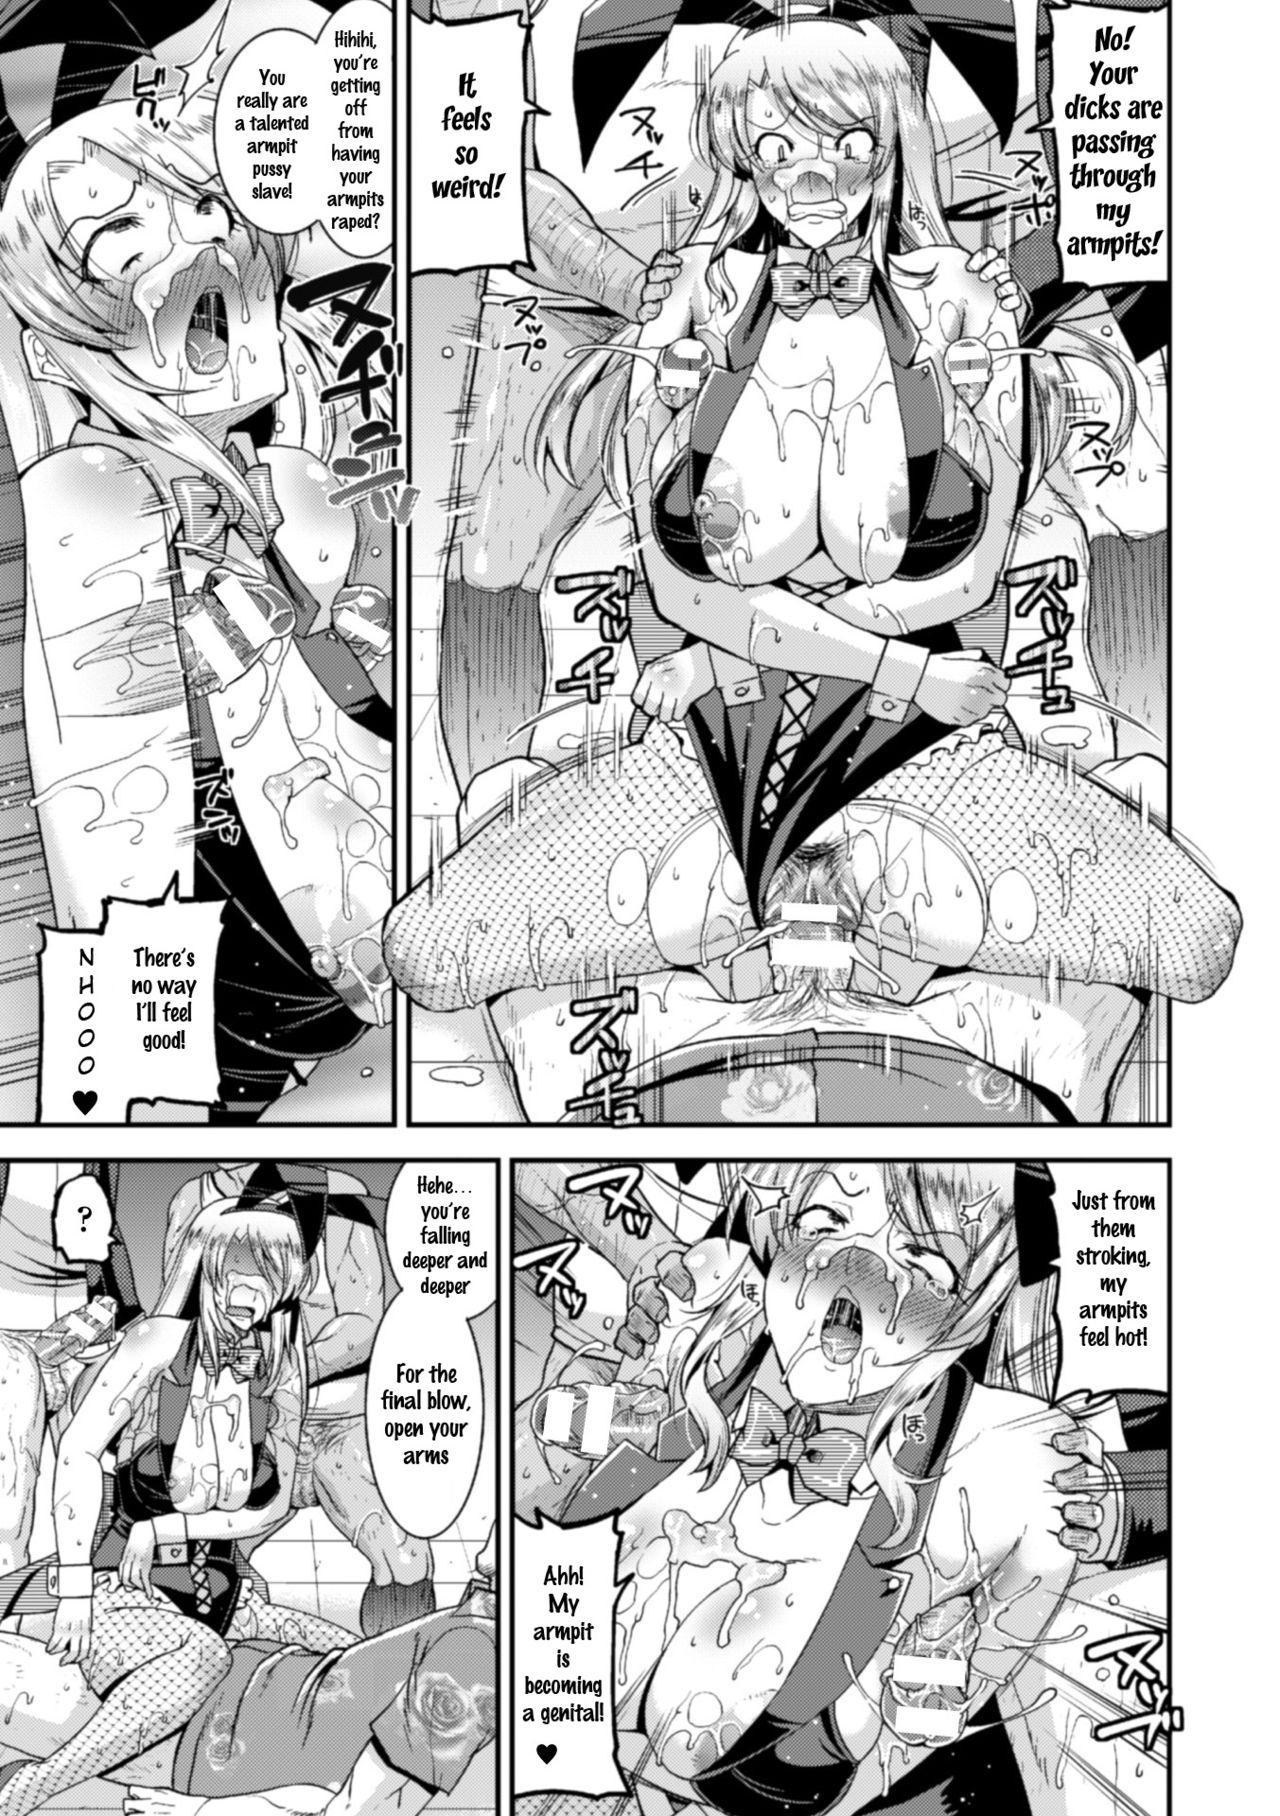 2D Comic Magazine Waki Fechi Bunny Girl Vol.1 Ch 1-3 64